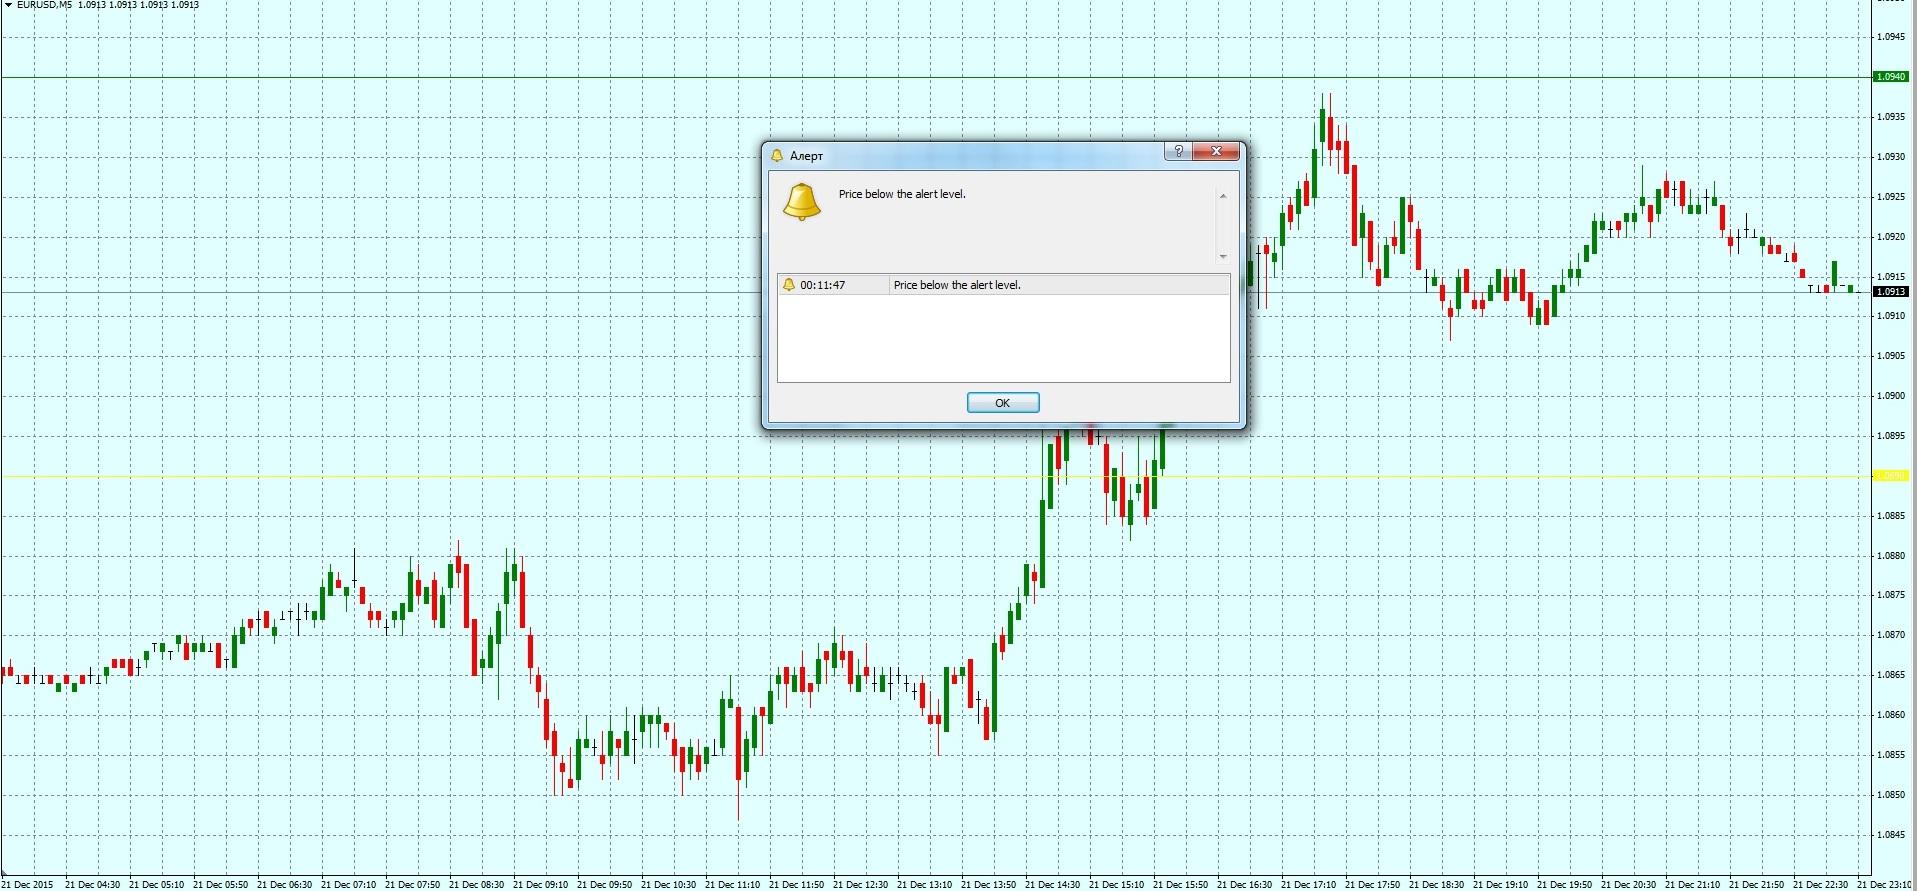 Форекс индикатор price alert описание биткоин в рубли